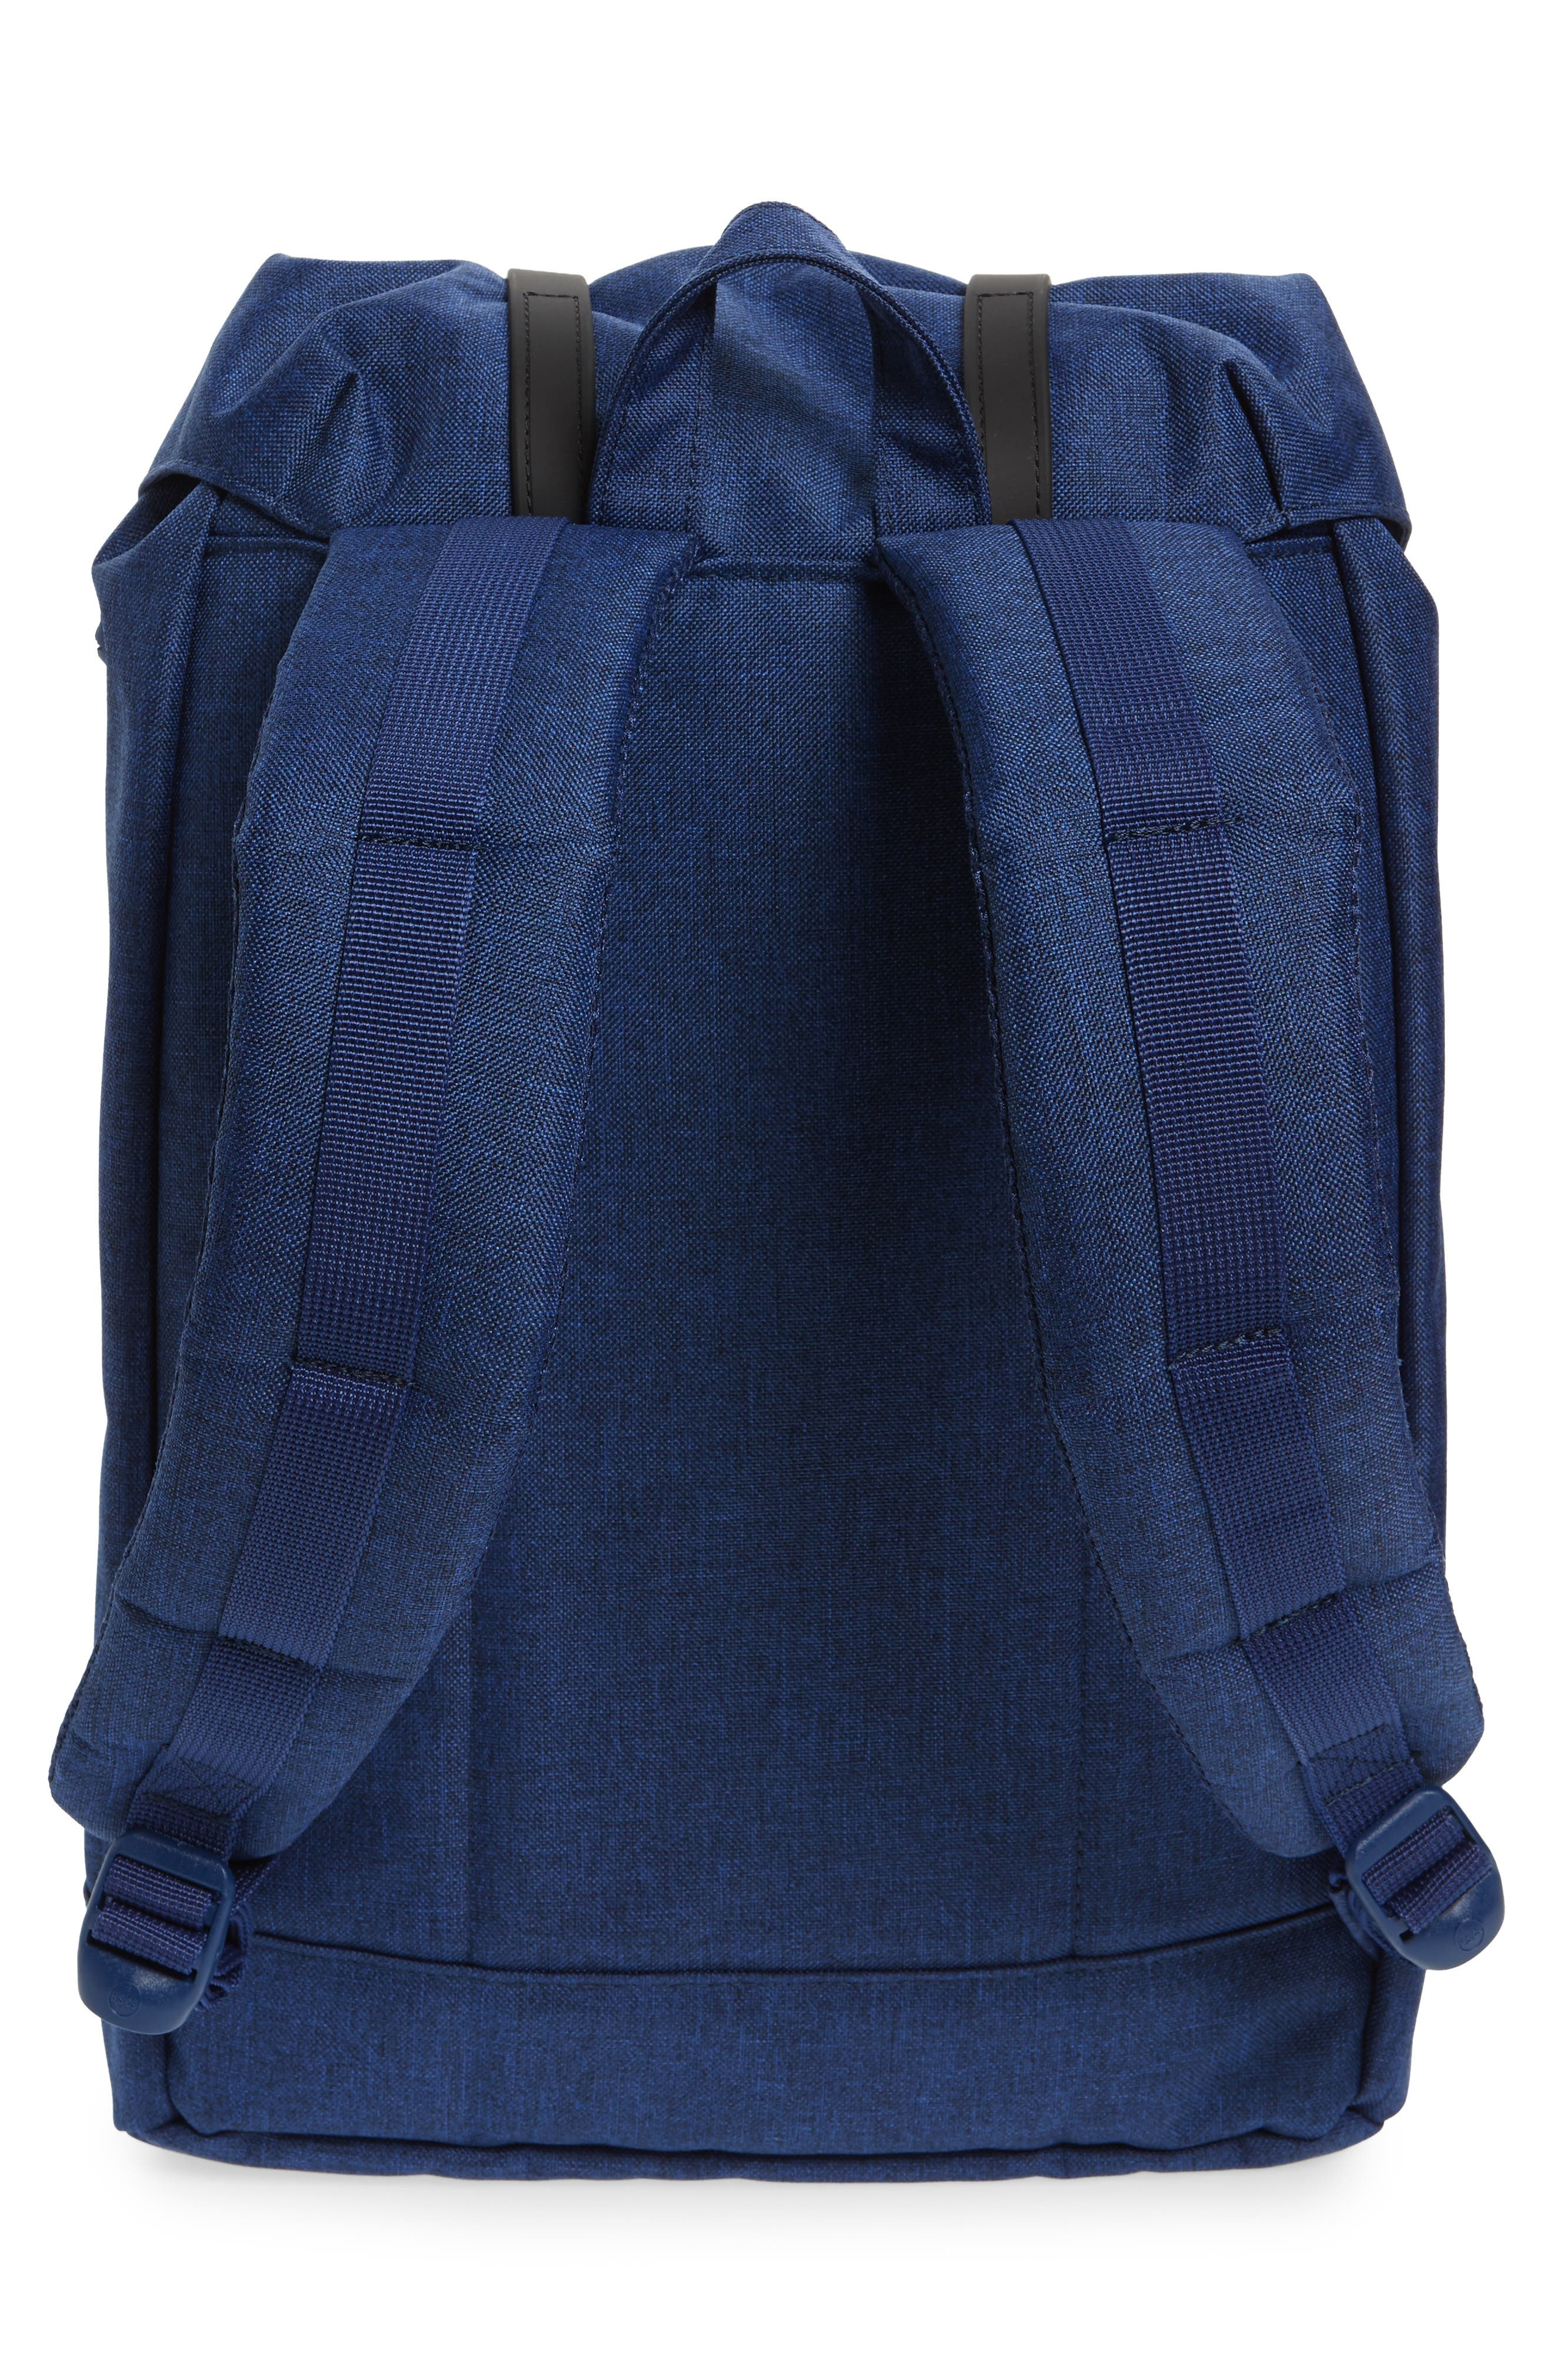 Retreat Backpack,                             Alternate thumbnail 3, color,                             091